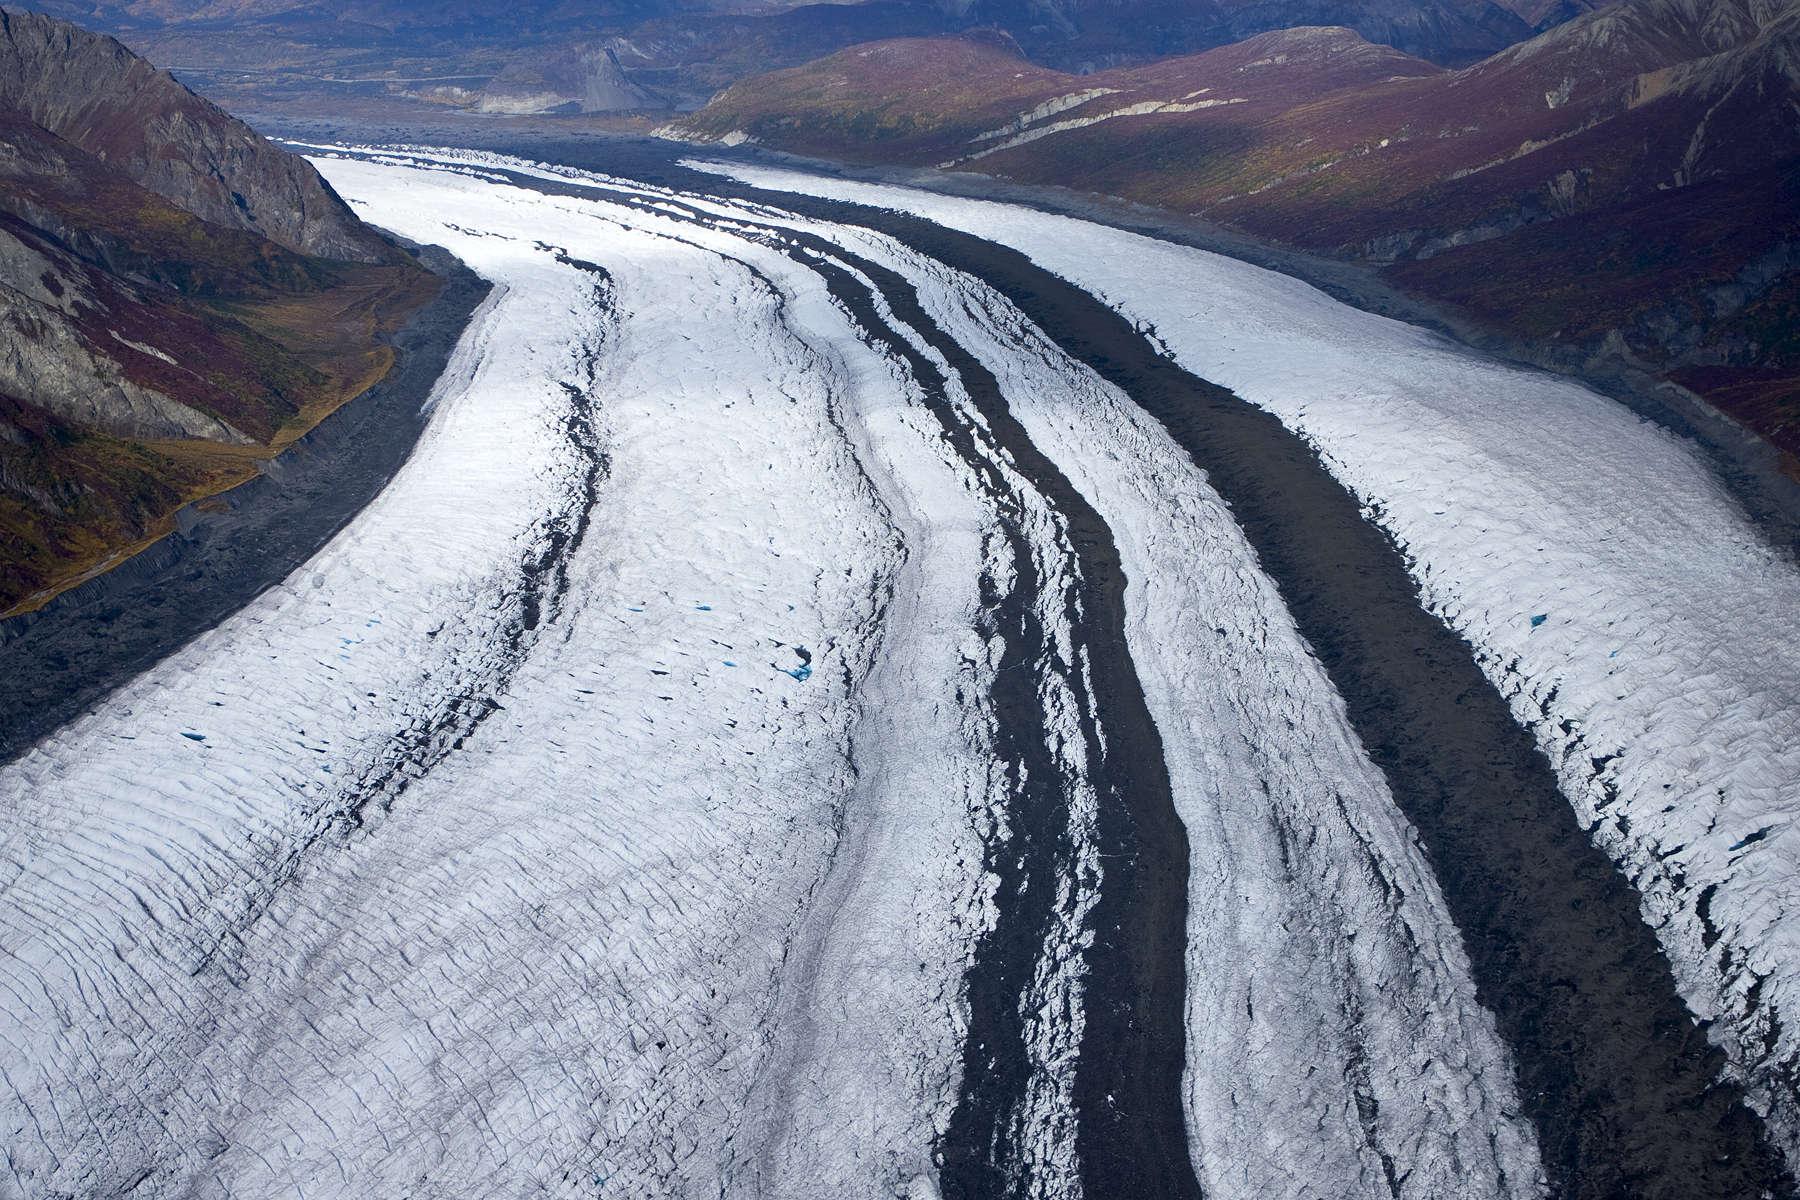 Aerial images of the {quote}Matanuska Glacier{quote}  in Alaska